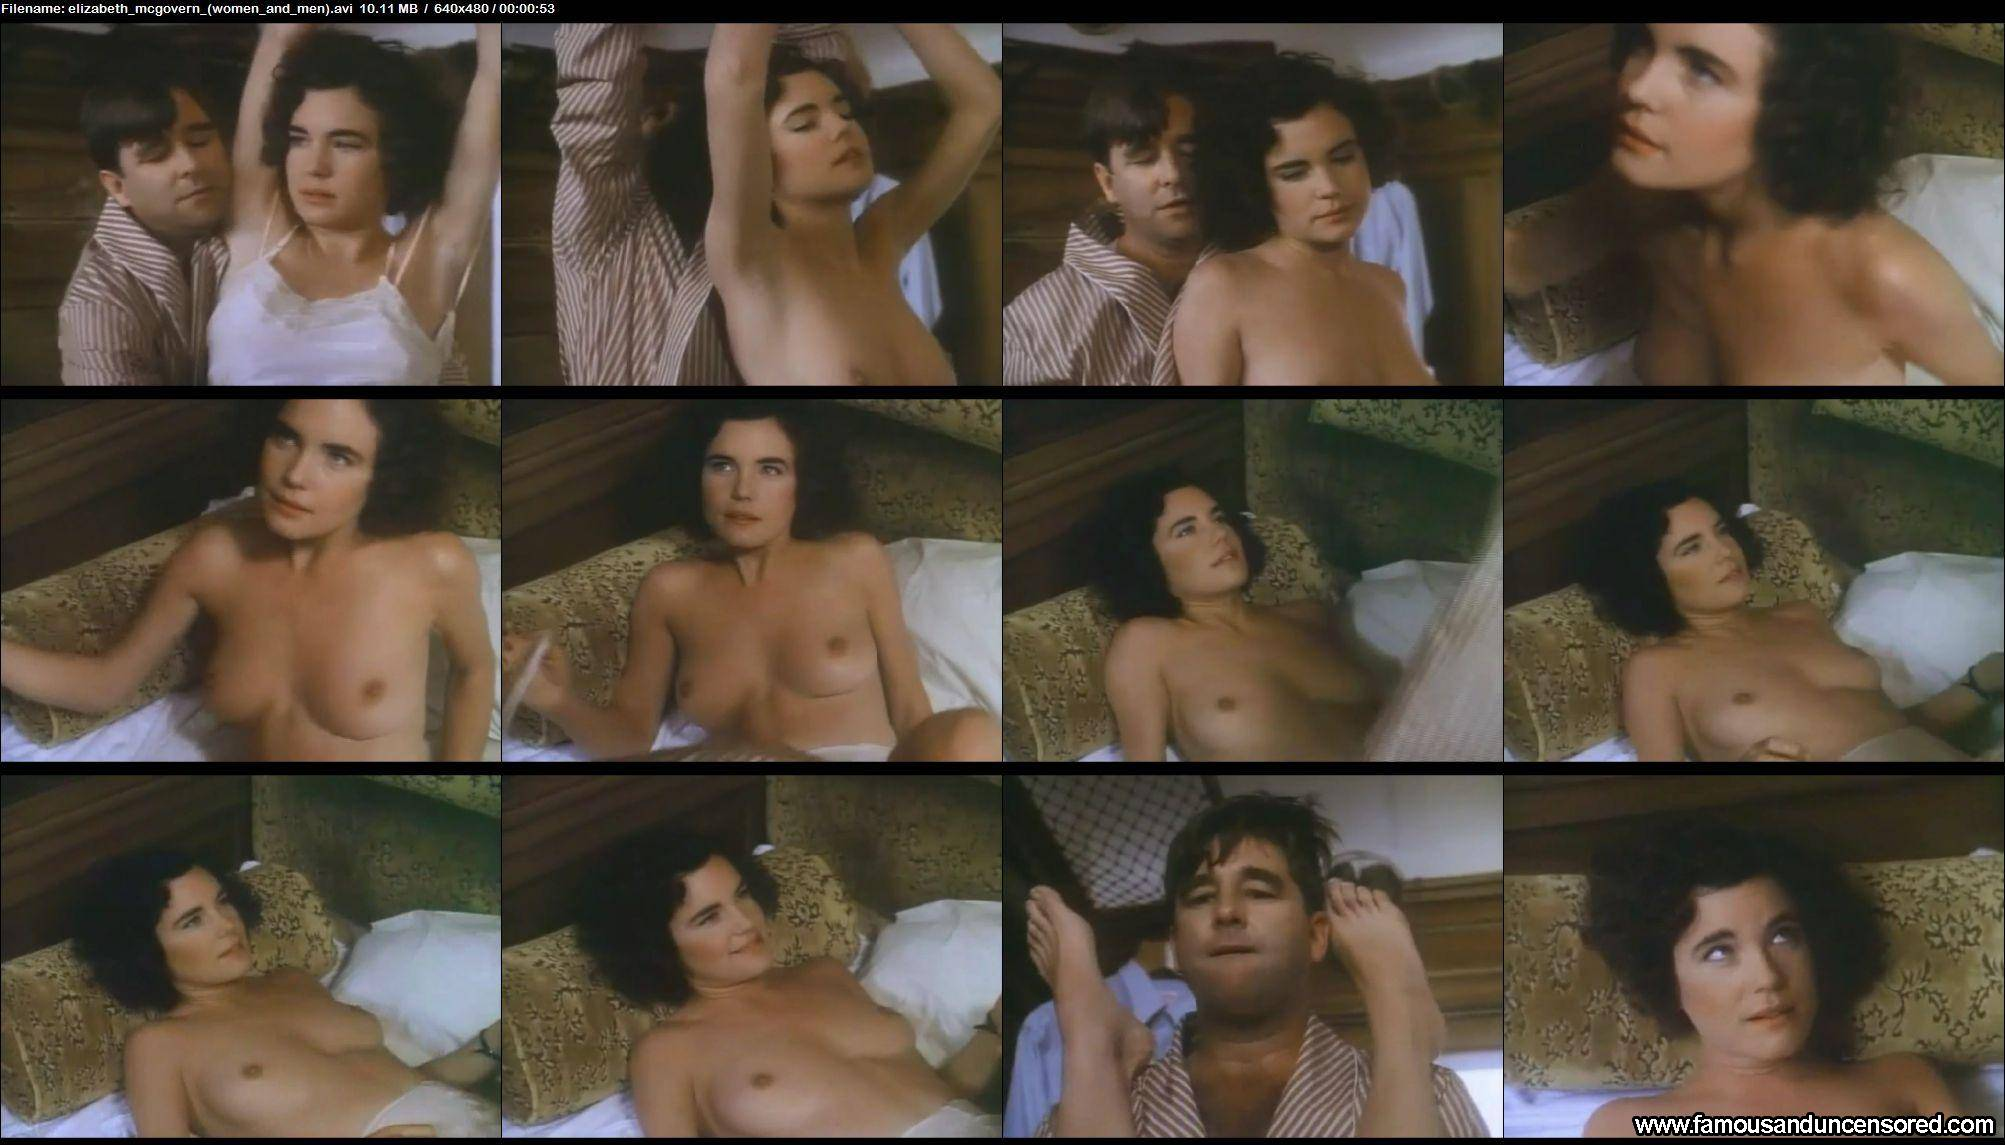 elizabeth mcgovern nude video